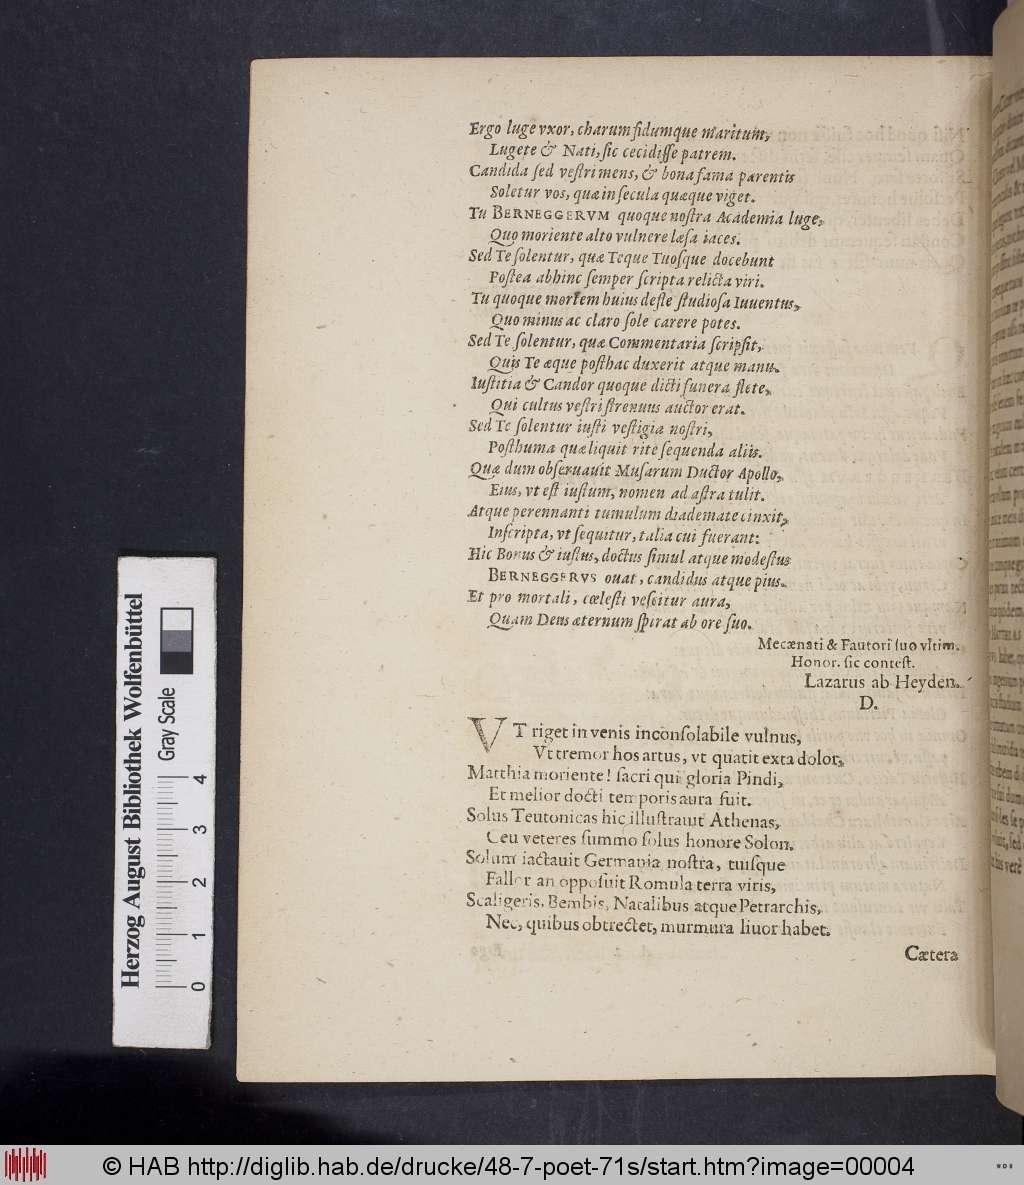 https://diglib.hab.de/drucke/48-7-poet-71s/00004.jpg